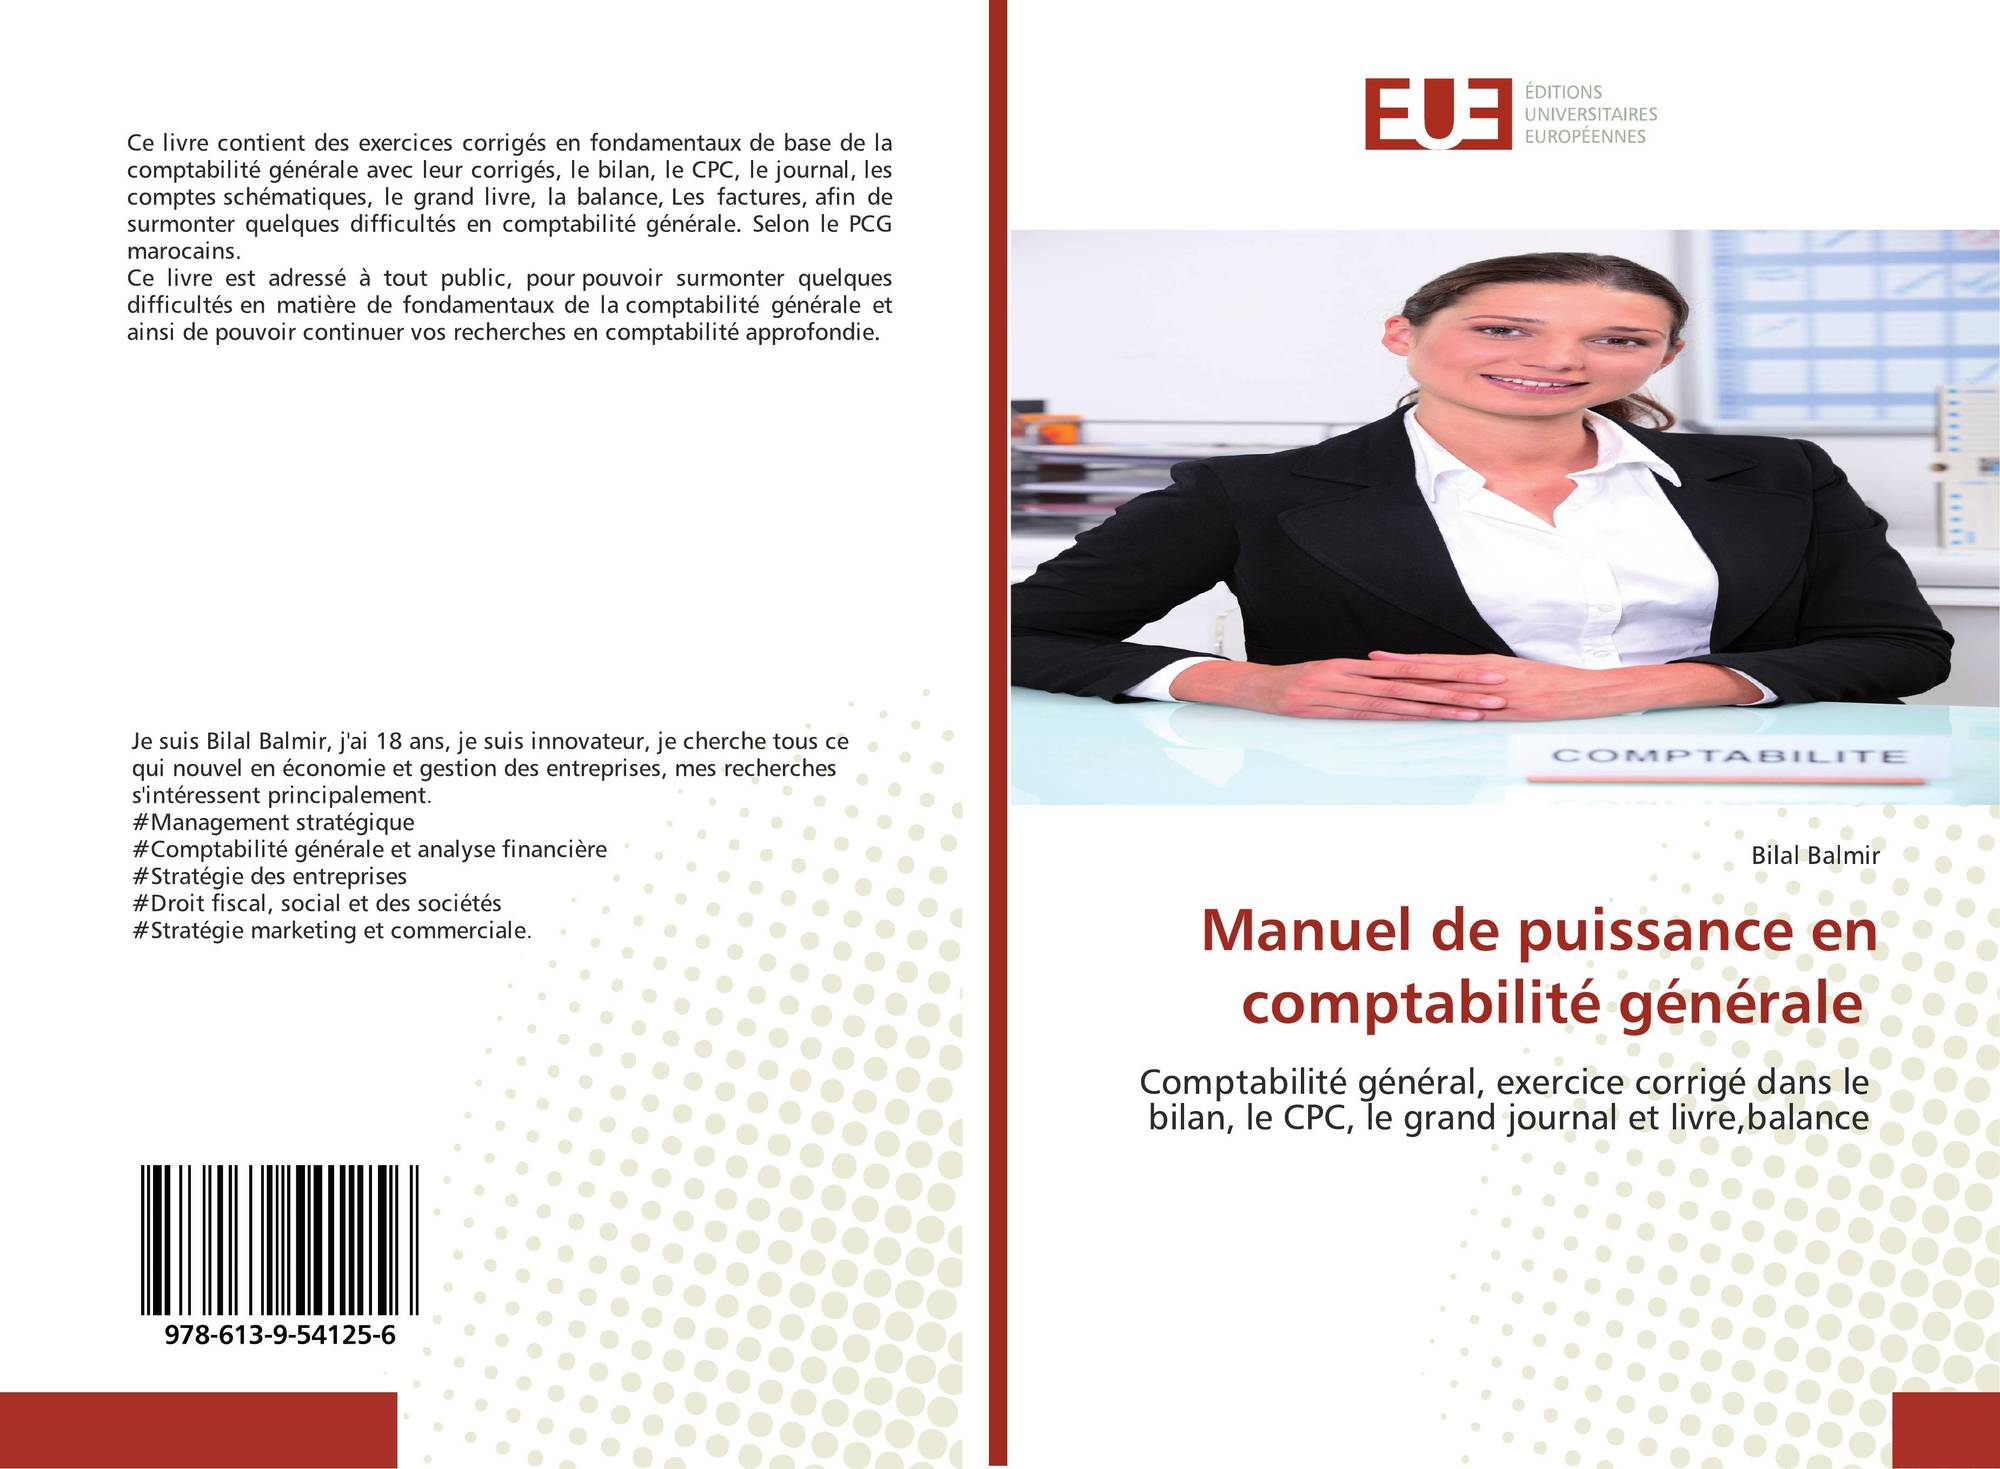 Manuel De Puissance En Comptabilite Generale 978 613 9 54125 6 6139541255 9786139541256 De Bilal Balmir